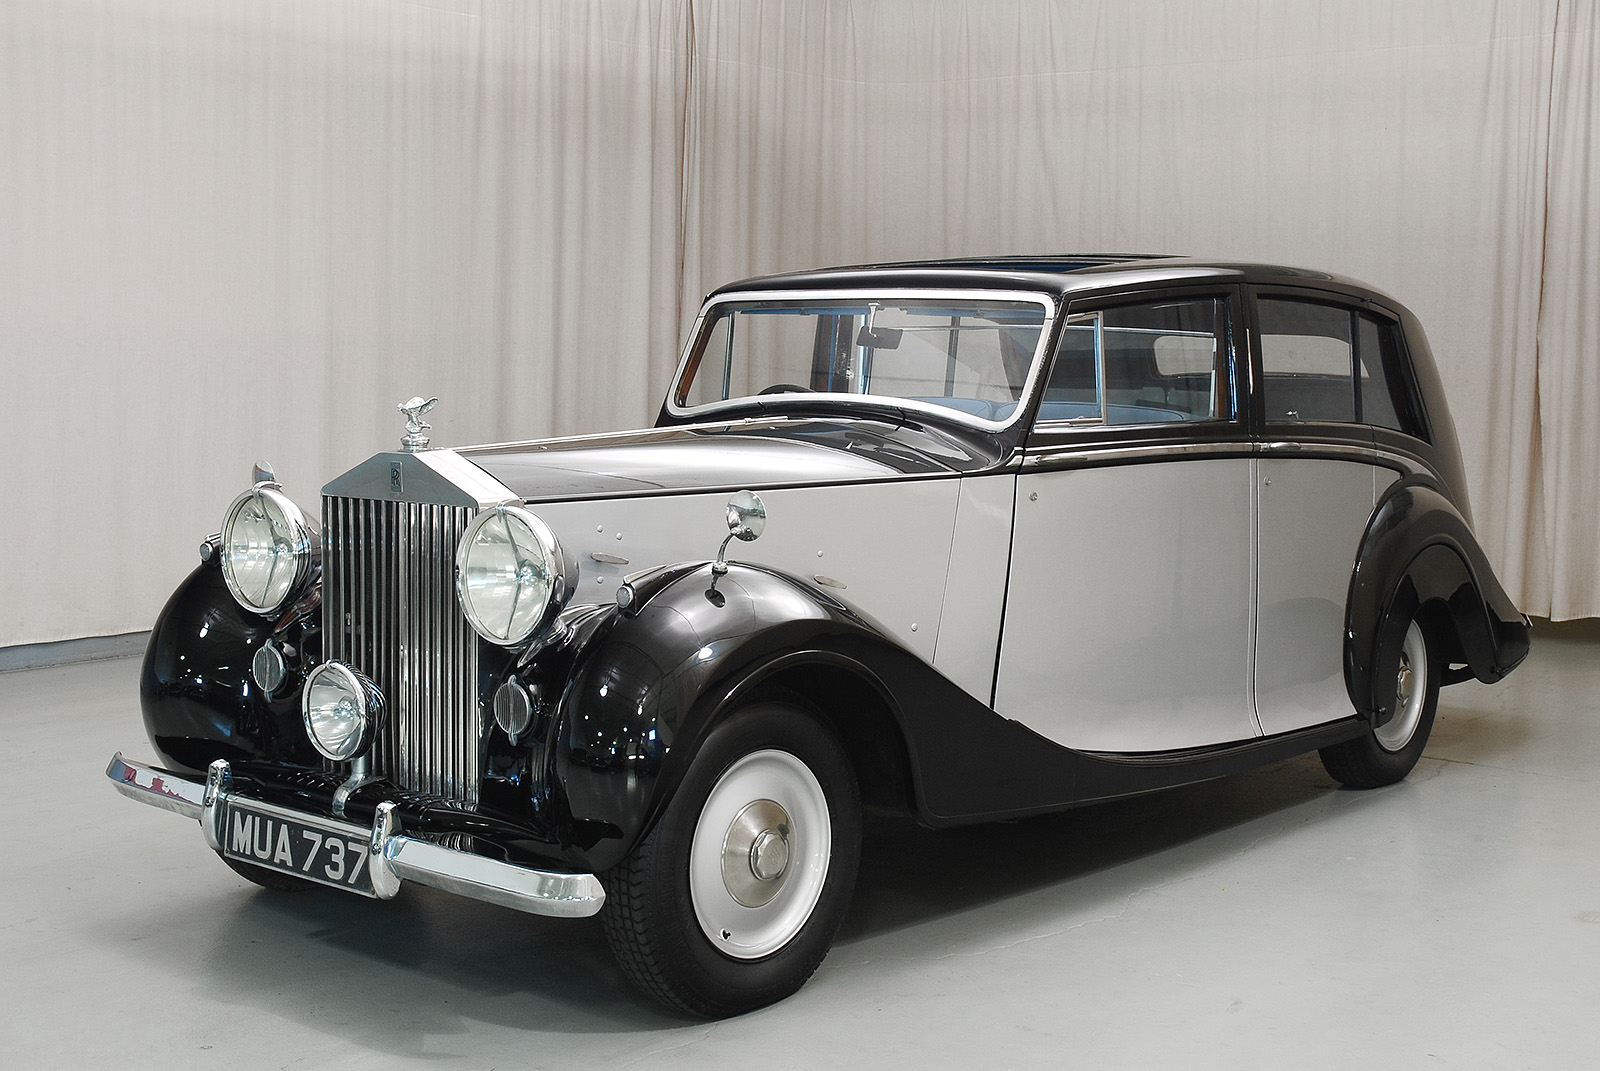 1949 Rolls Royce Silver Wraith Limousine Hyman Ltd